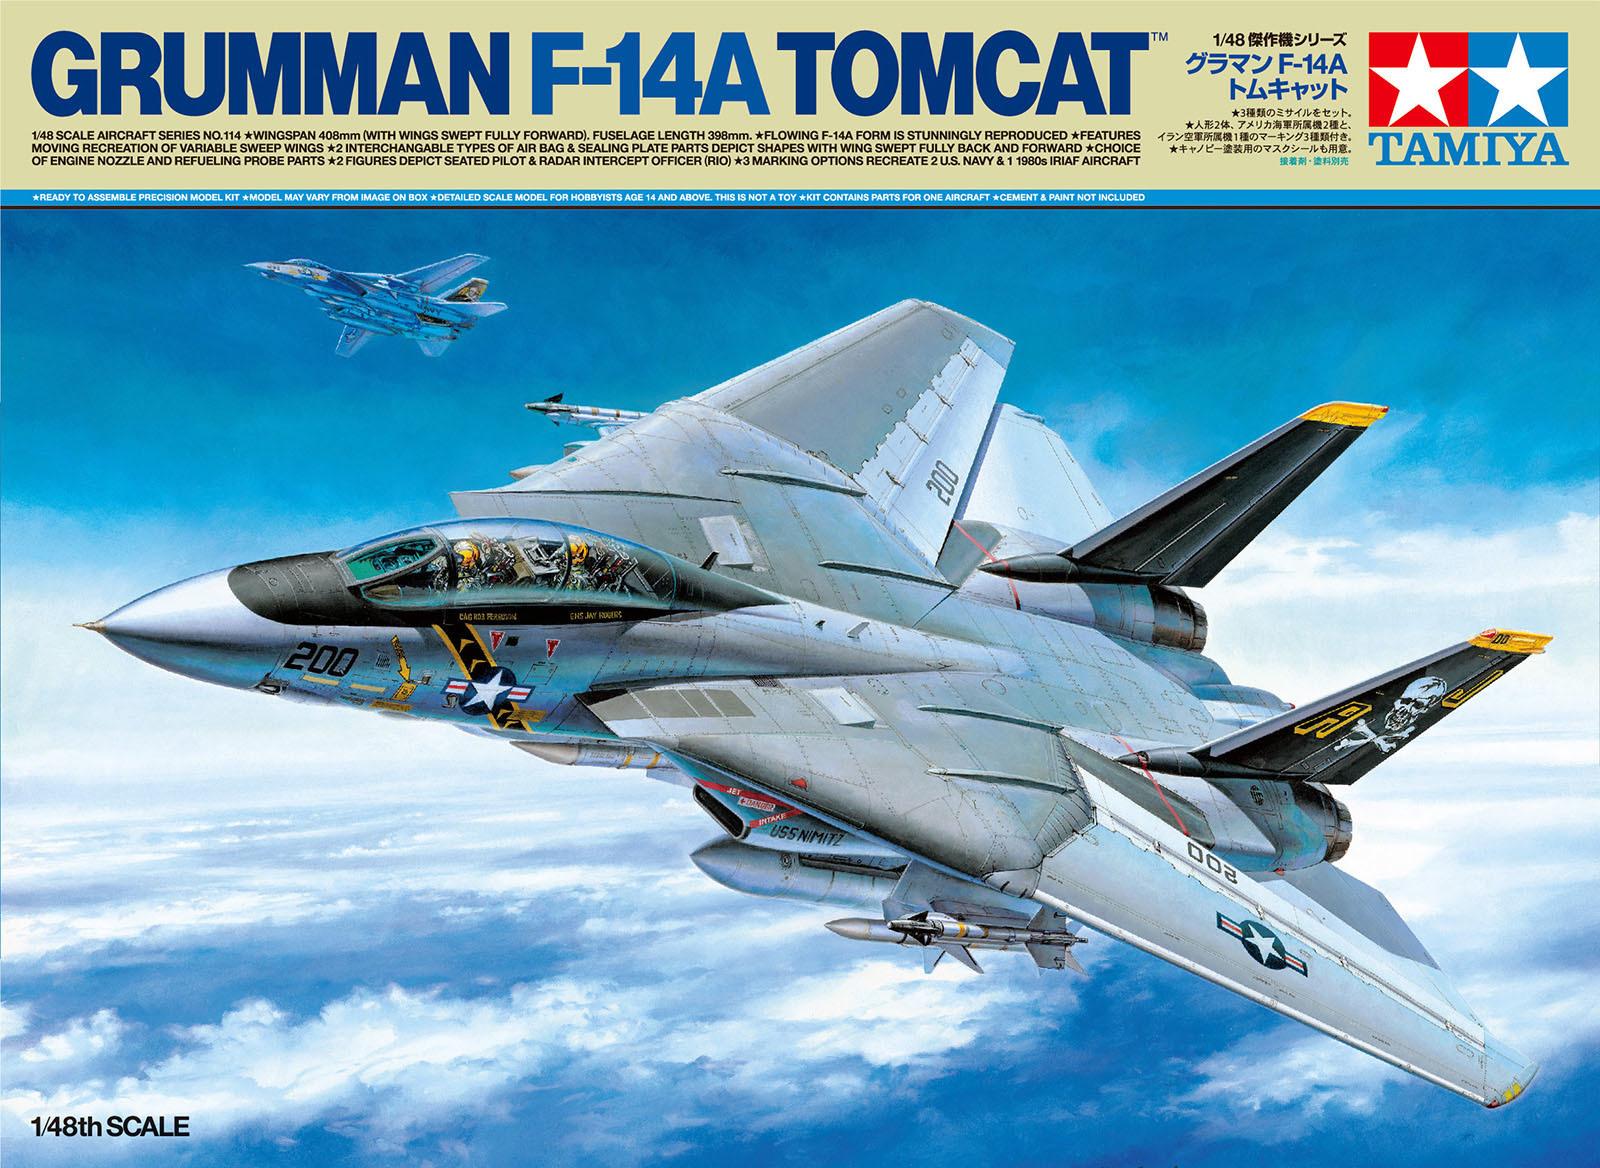 TAMIYA 1/48 Scale Grumman F-14A Tomcat_b0029315_09263019.jpg